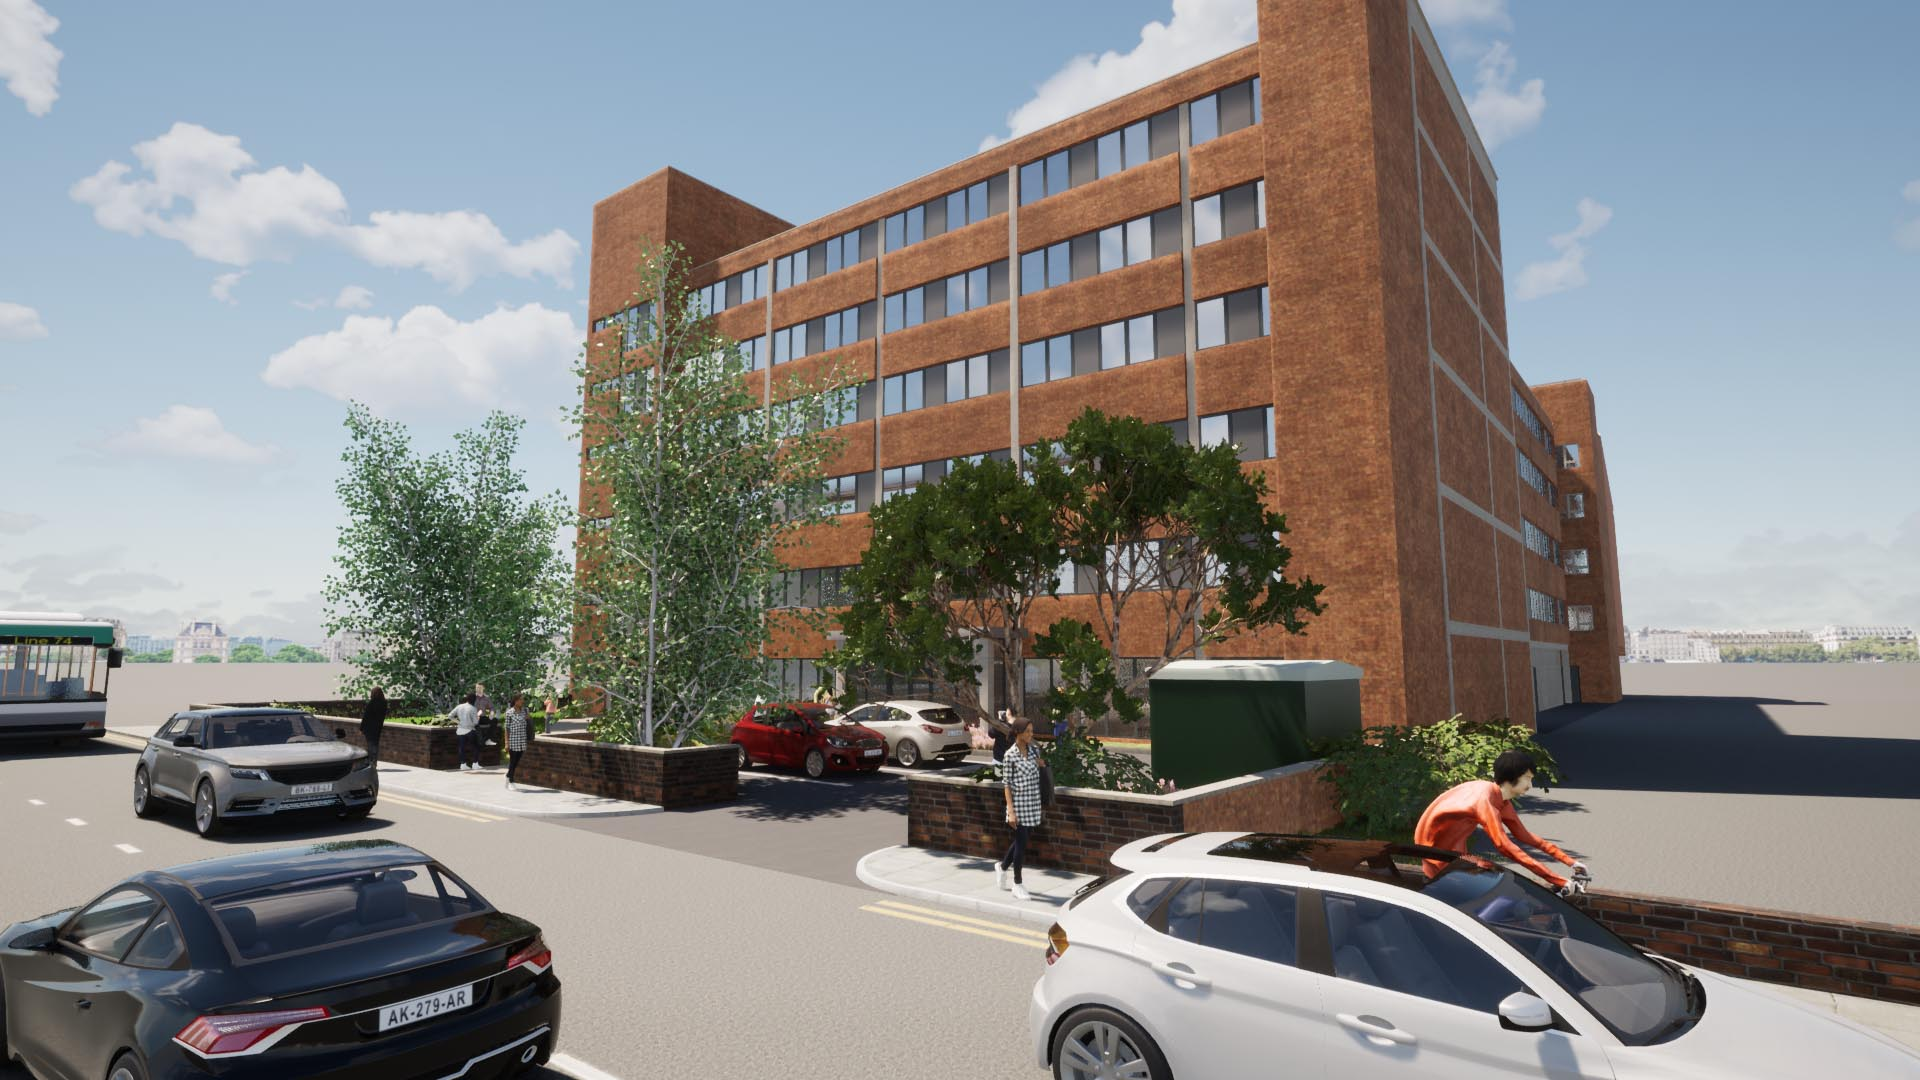 LANDMARK DERBY BUILDING PLANNING APPROVED FOR NEW STUDENT SCHEME